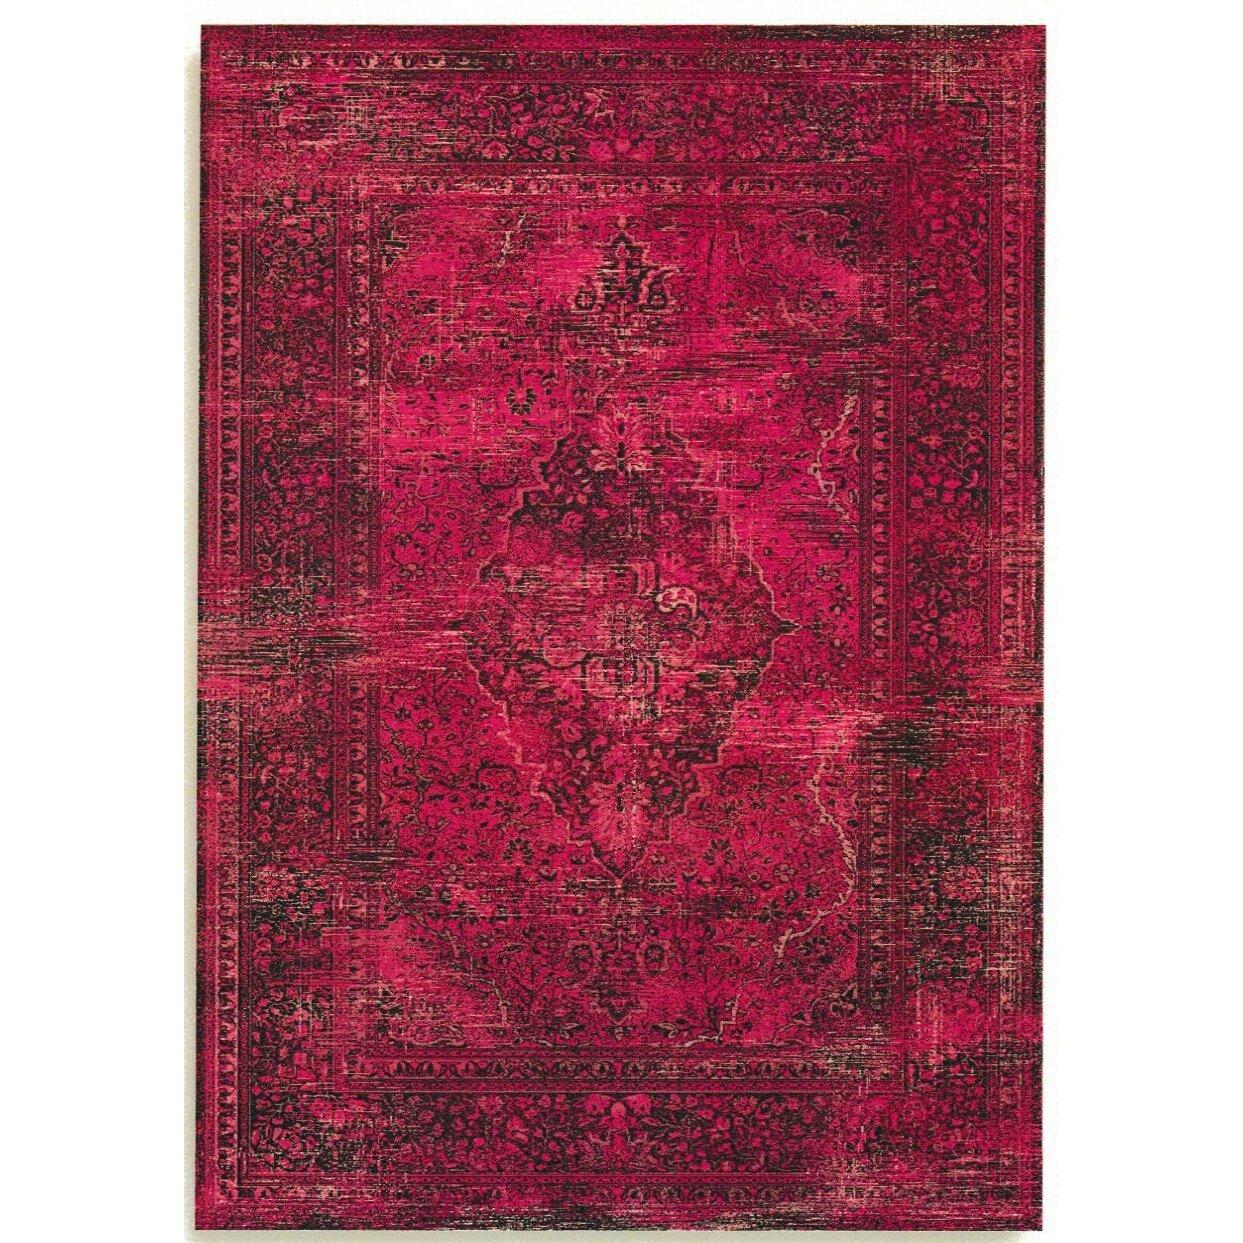 Barefoot Artsilk Rugs Persian Antika Pink Area Rug